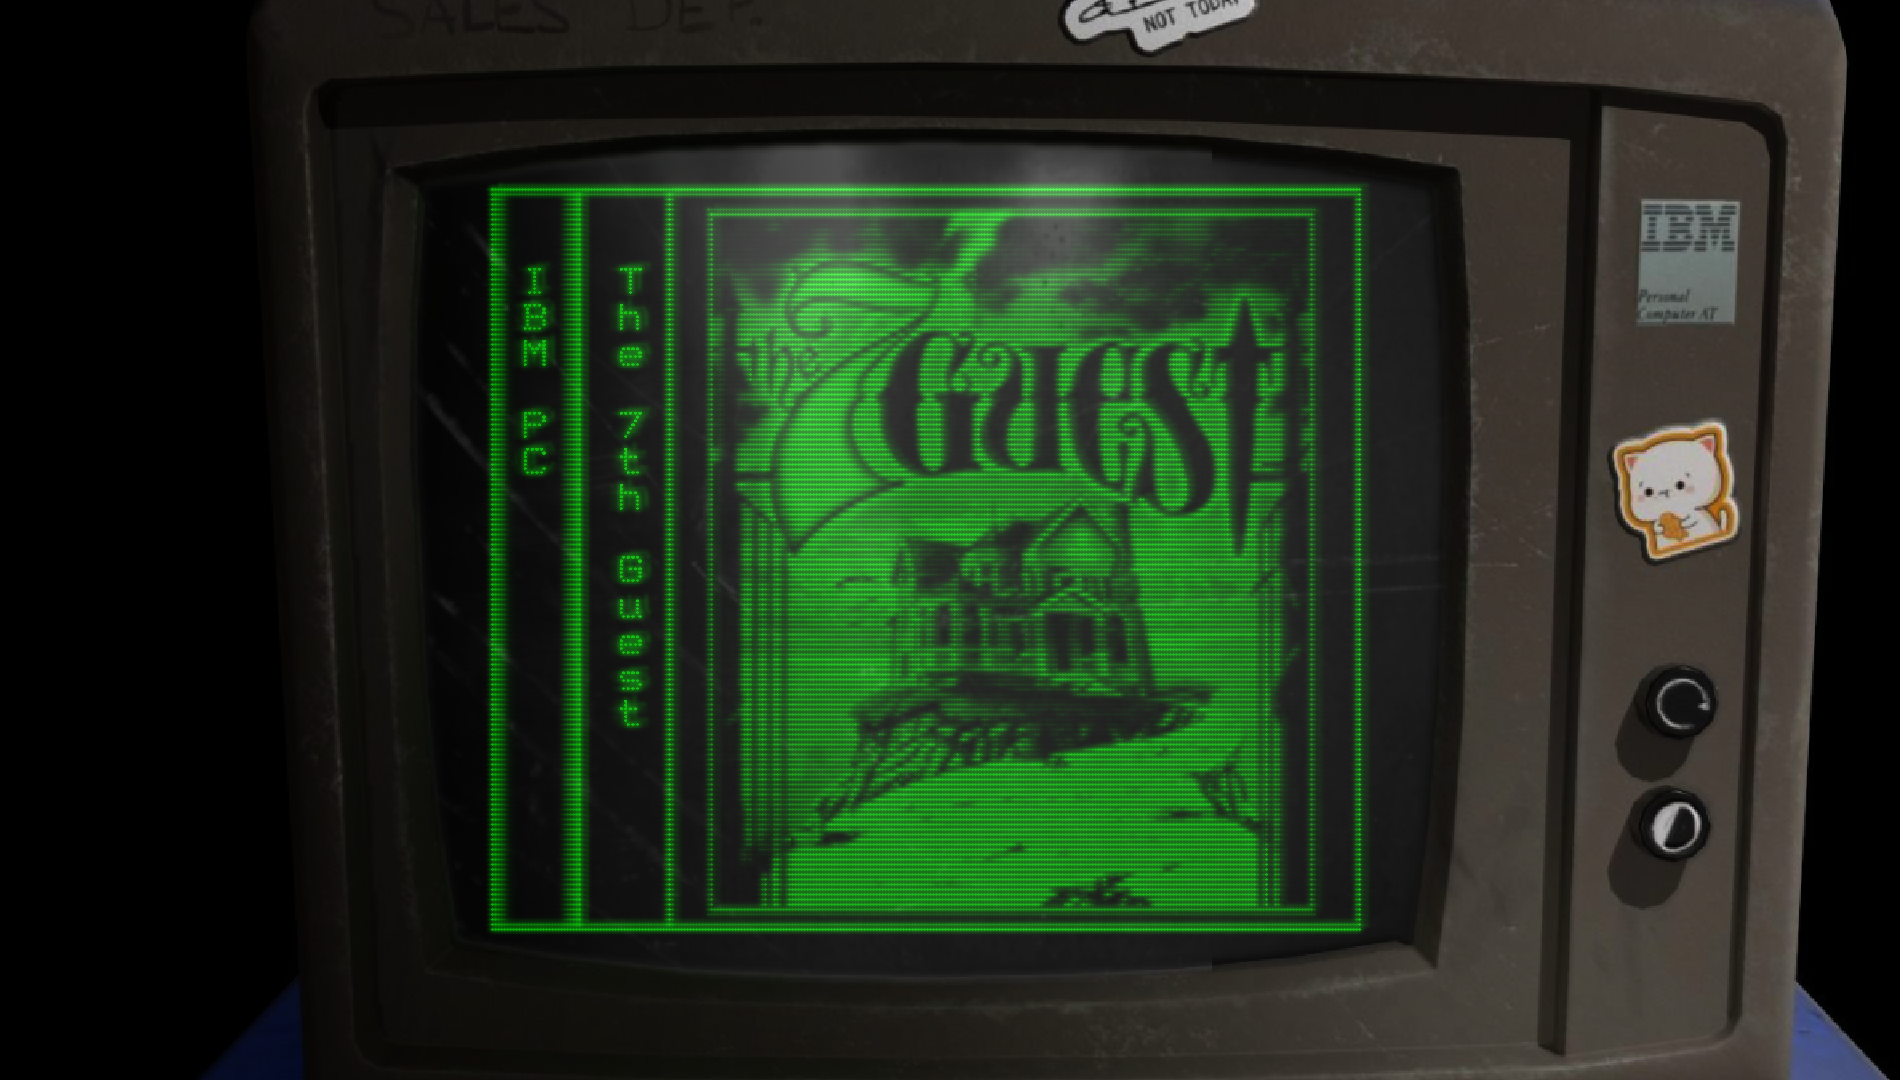 Big Green CRT (FREE Version)